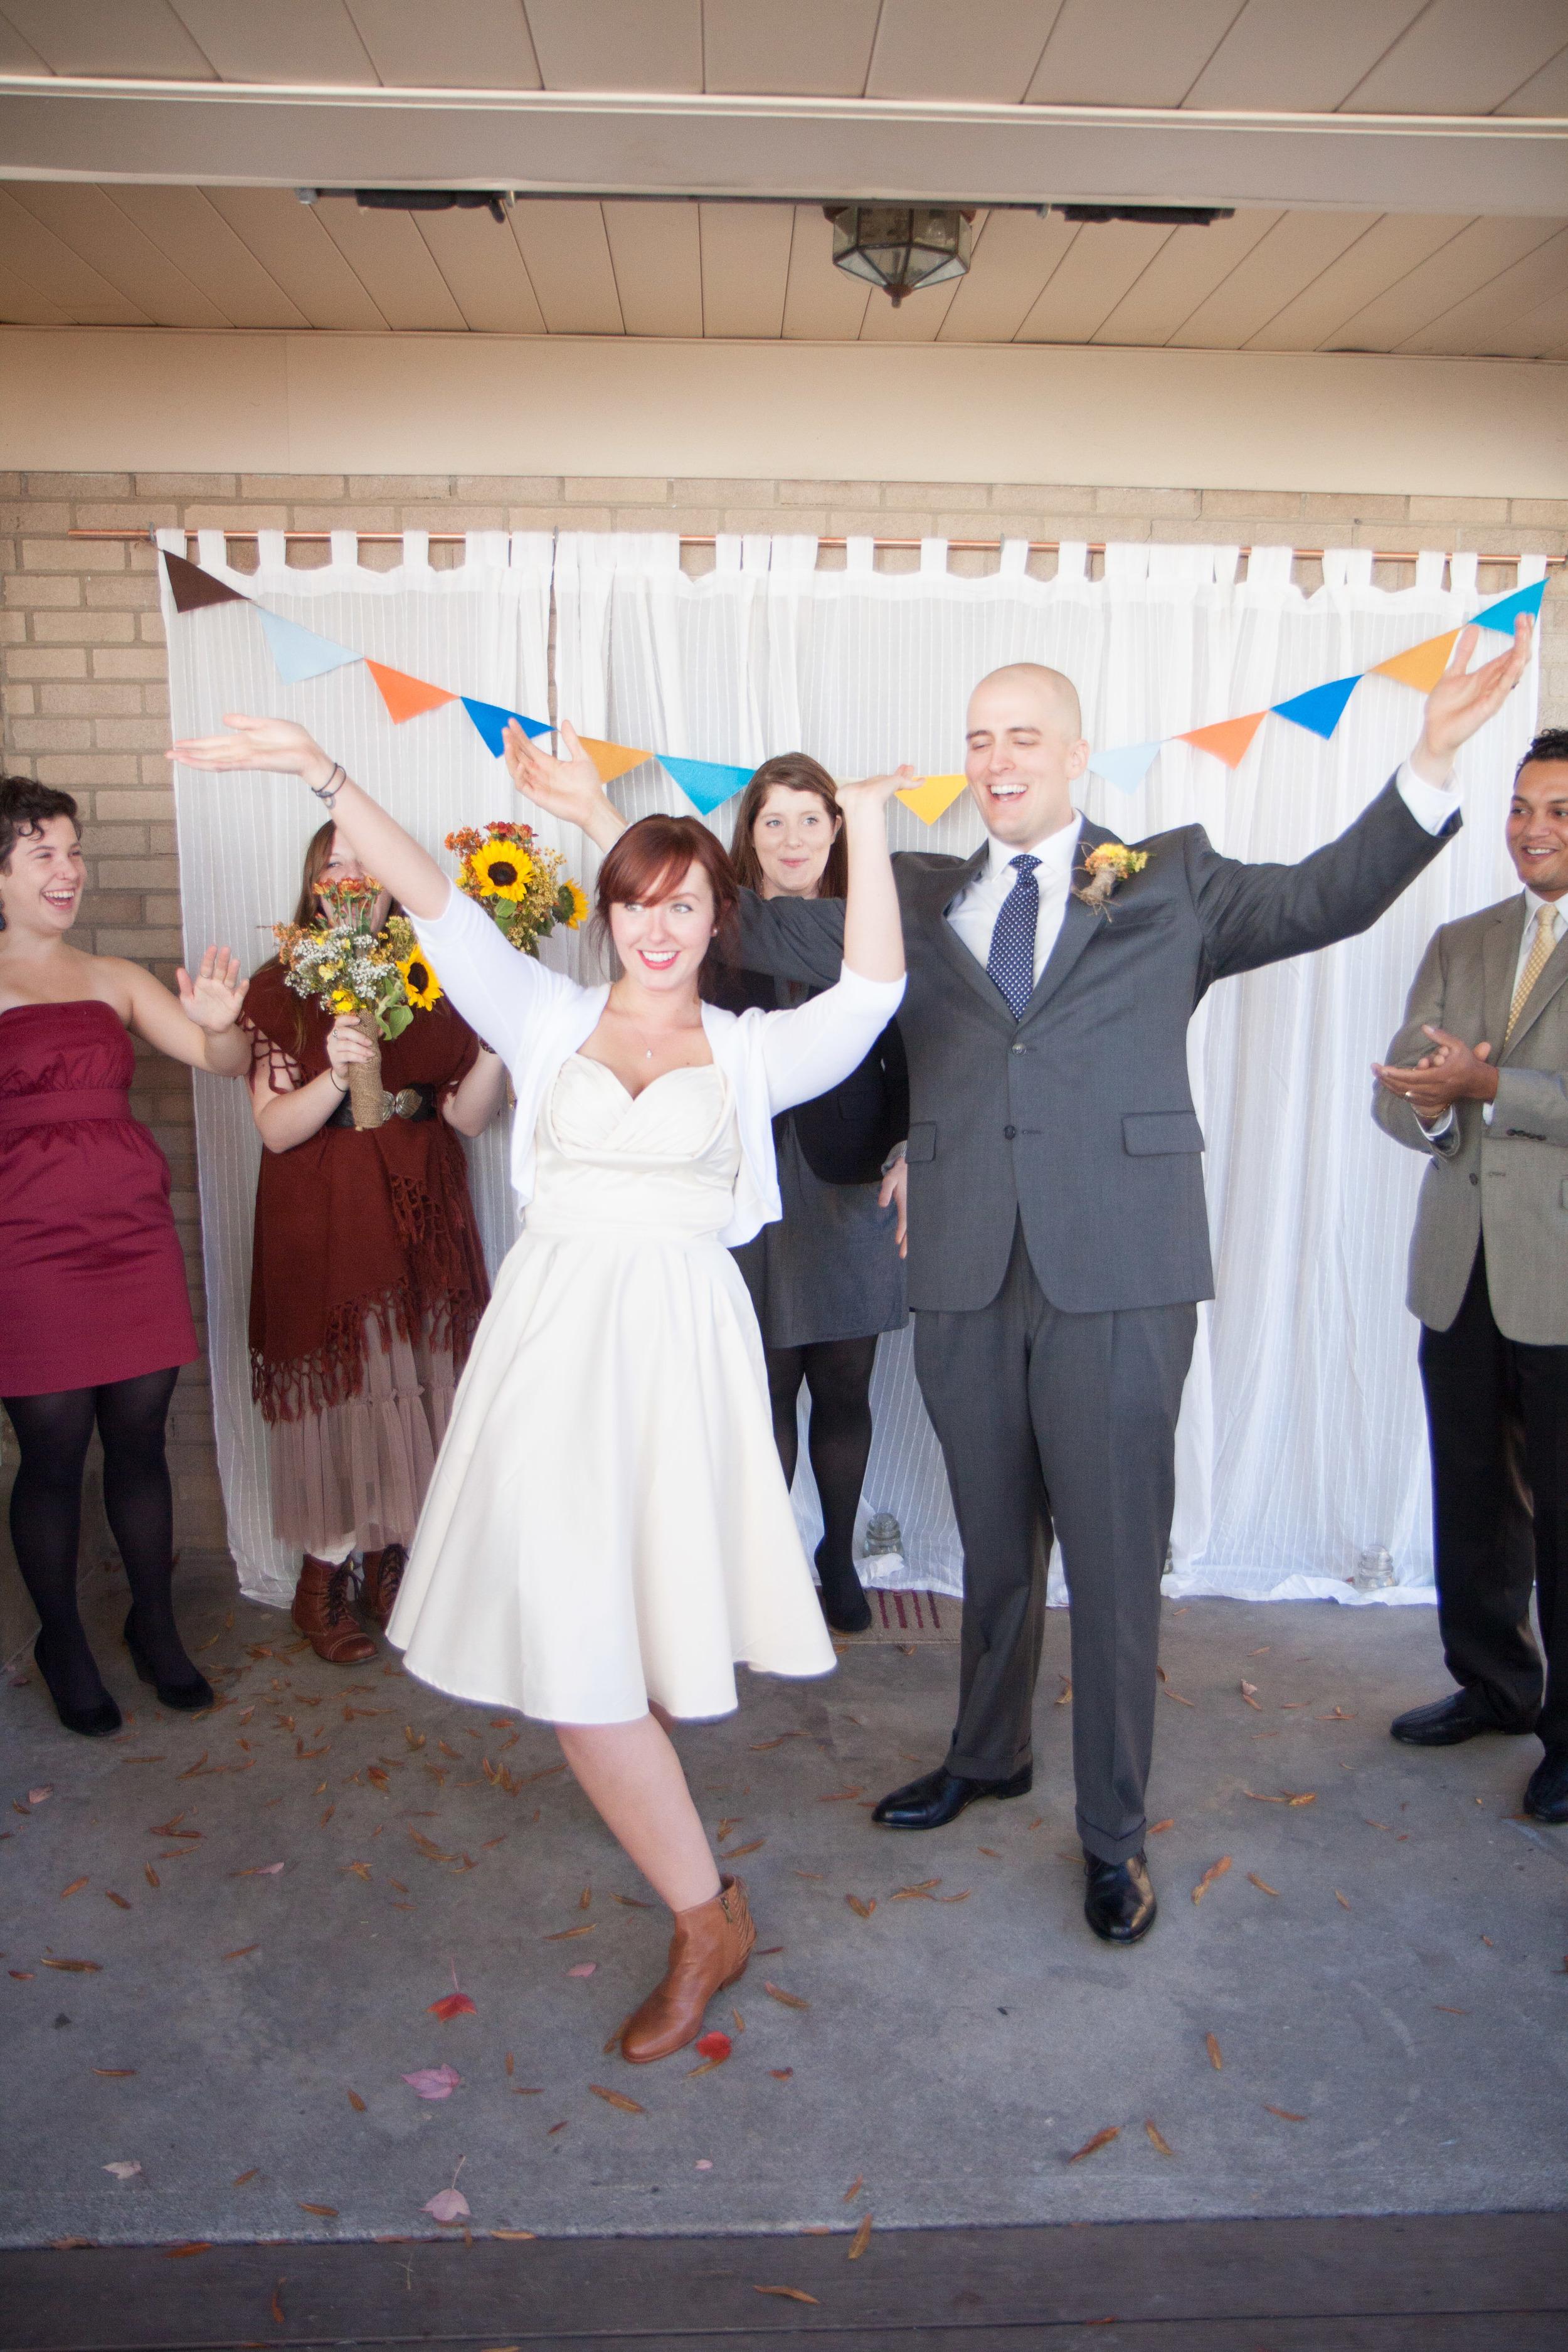 Wilson Bickel Wedding - Reception and Ceremony (125 of 526).jpg